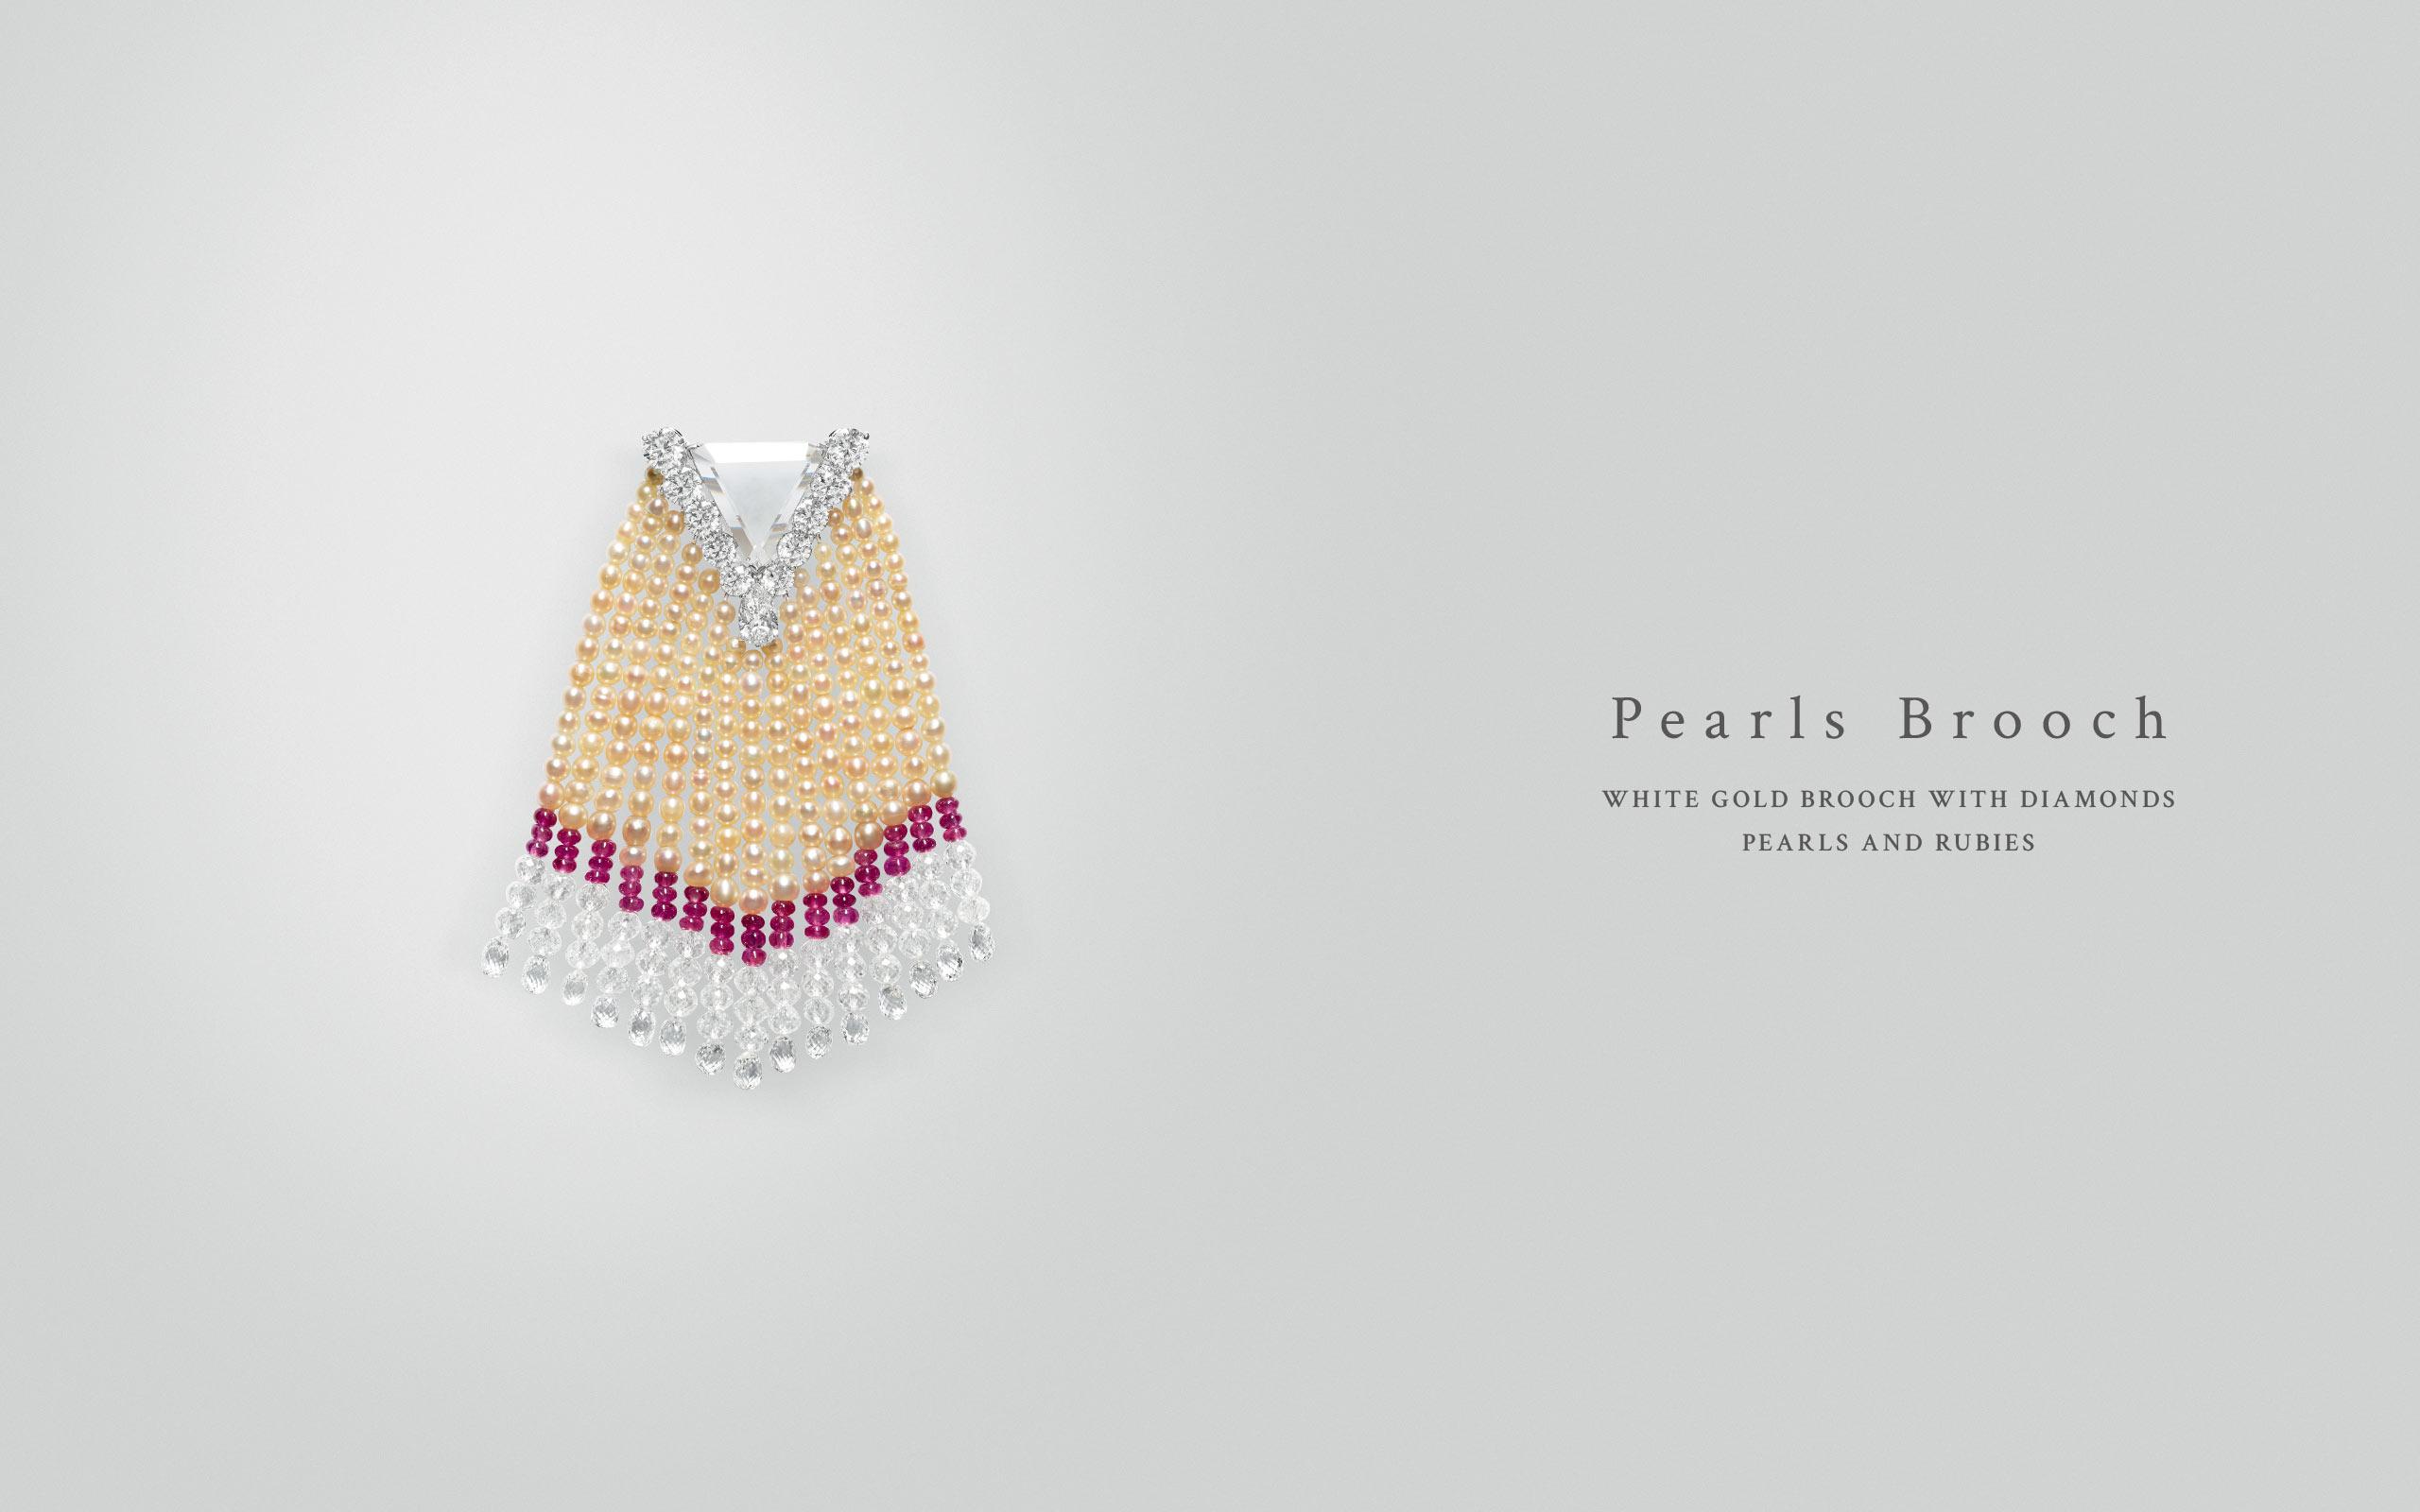 Pearls Brooch 08 | Maria Gaspari